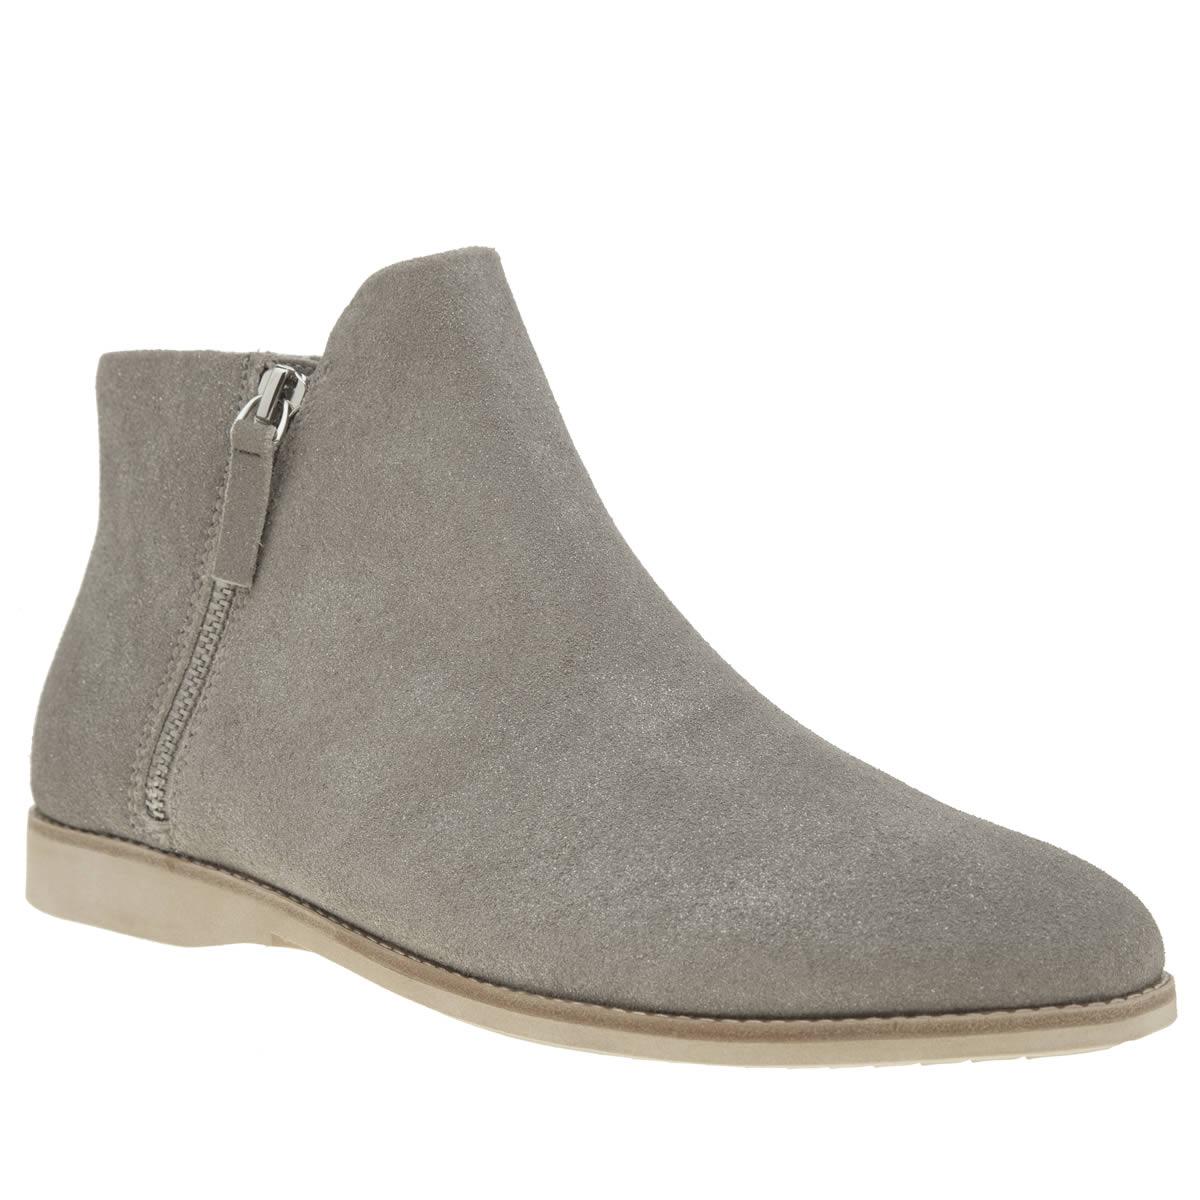 rollie nation Rollie Nation Grey Sidezip Bootie Boots